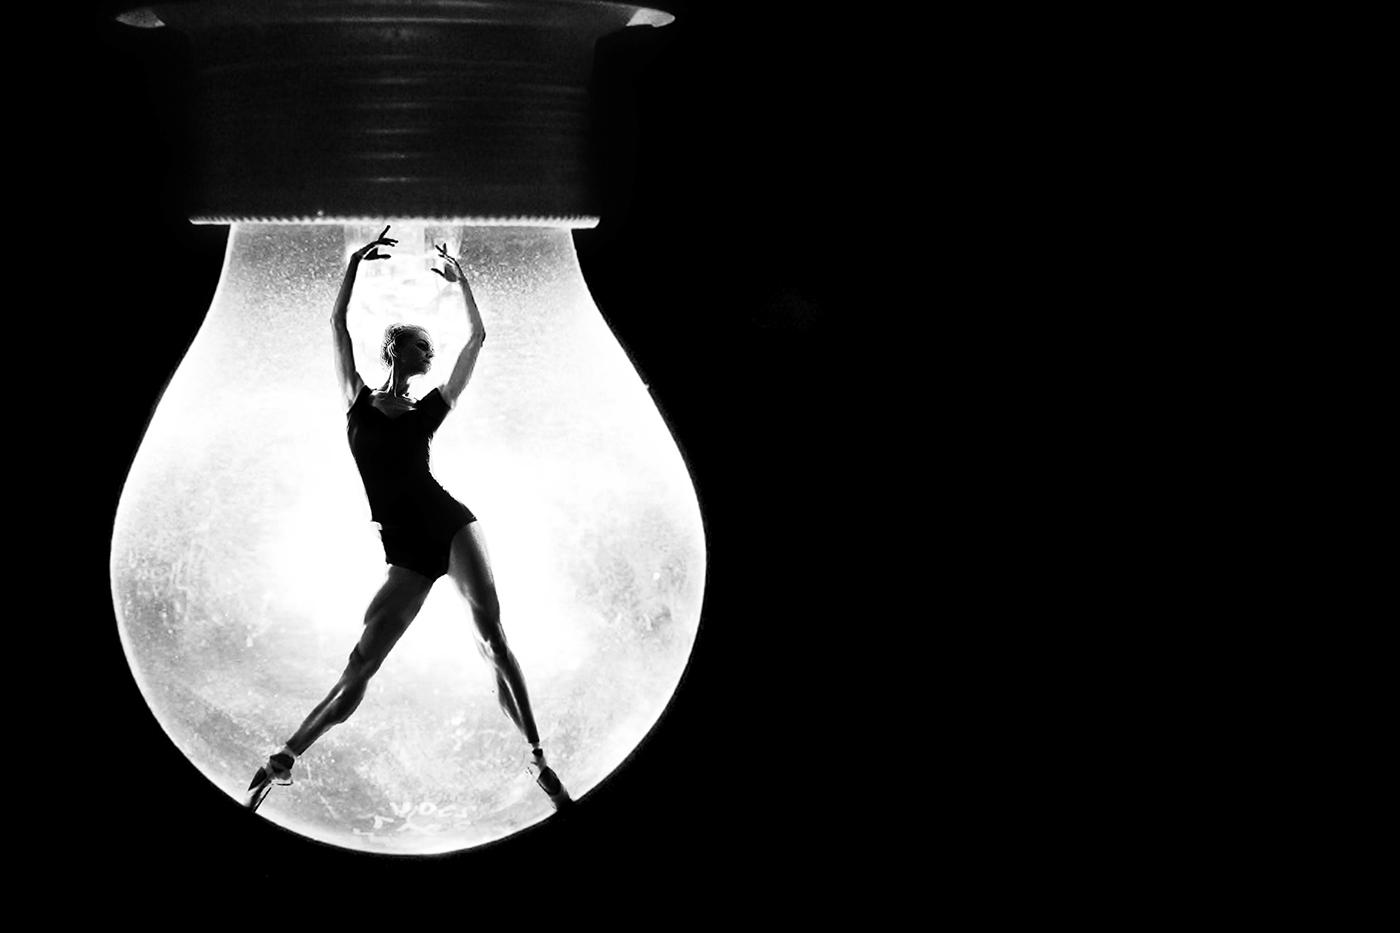 Creative Dance Photography Tutorial By Soli Art on Behance